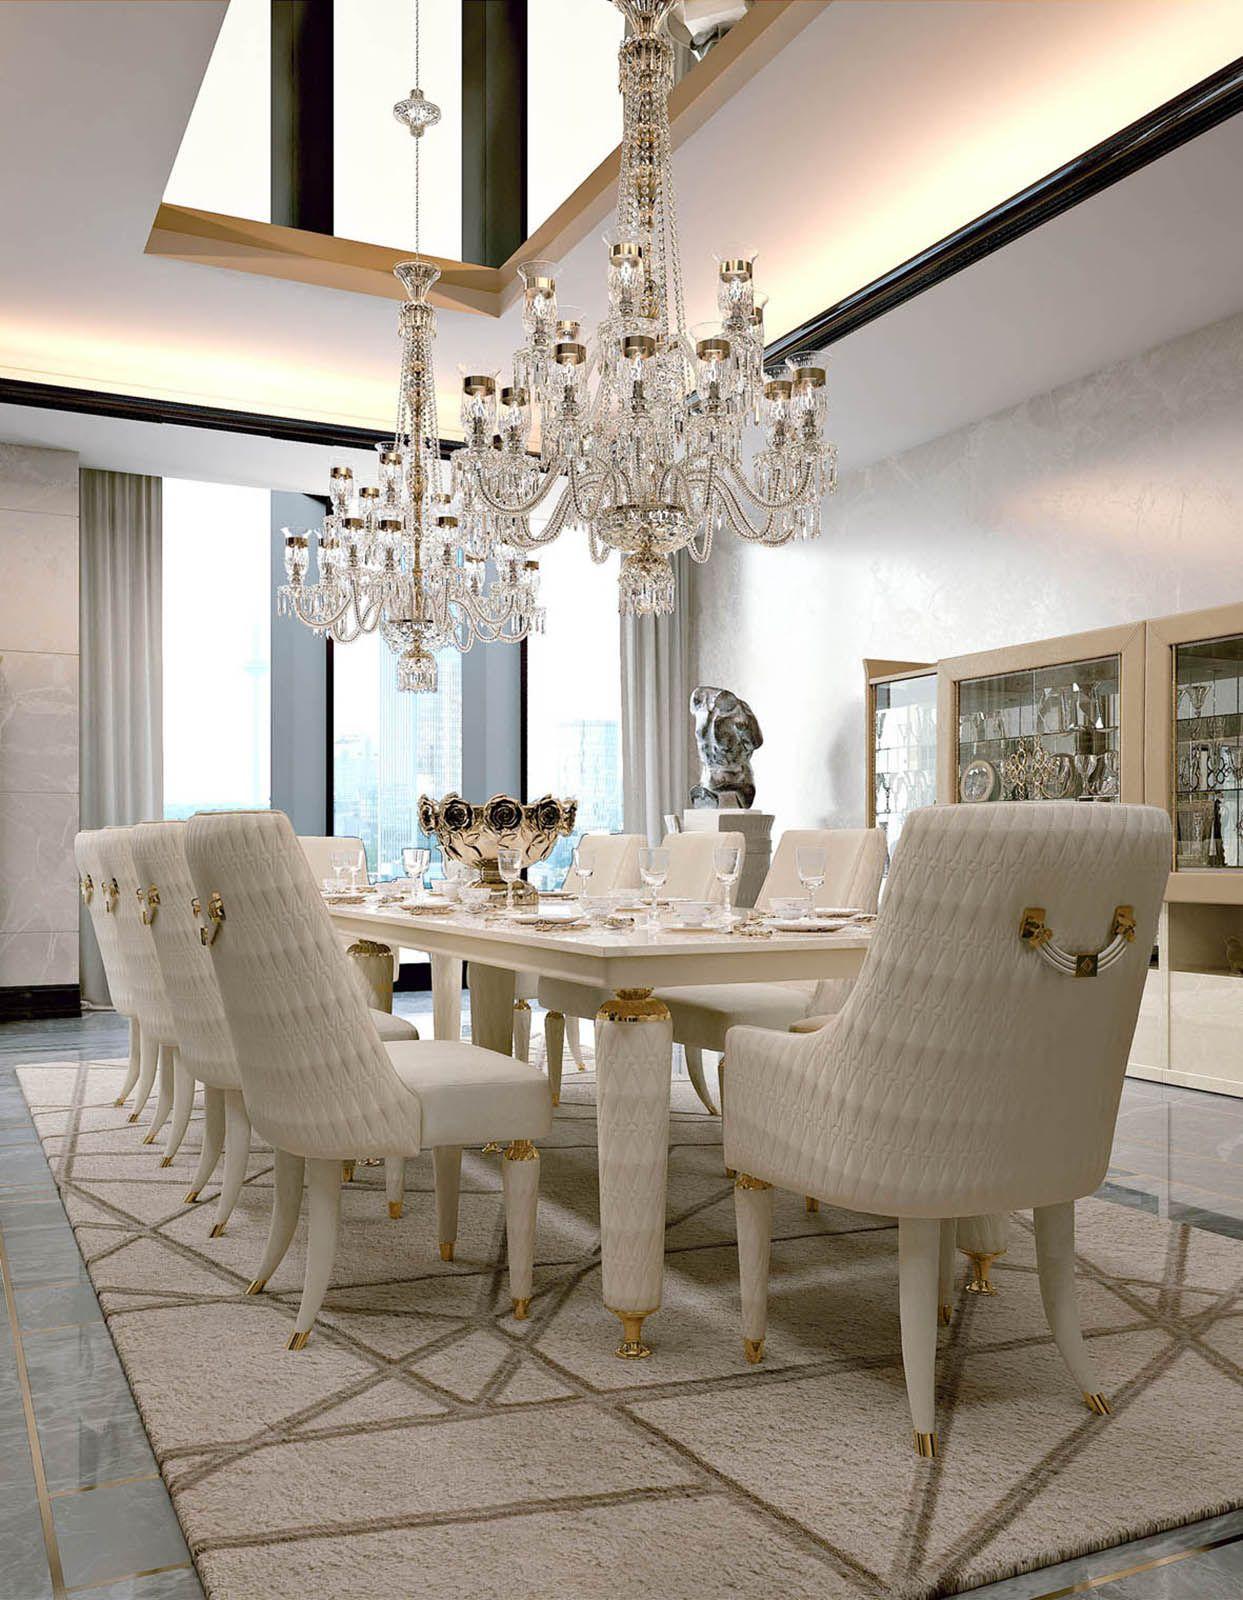 luxury dining room sets. Numero Tre Collection Www.turri.it Italian Luxury Dining Room Table Sets